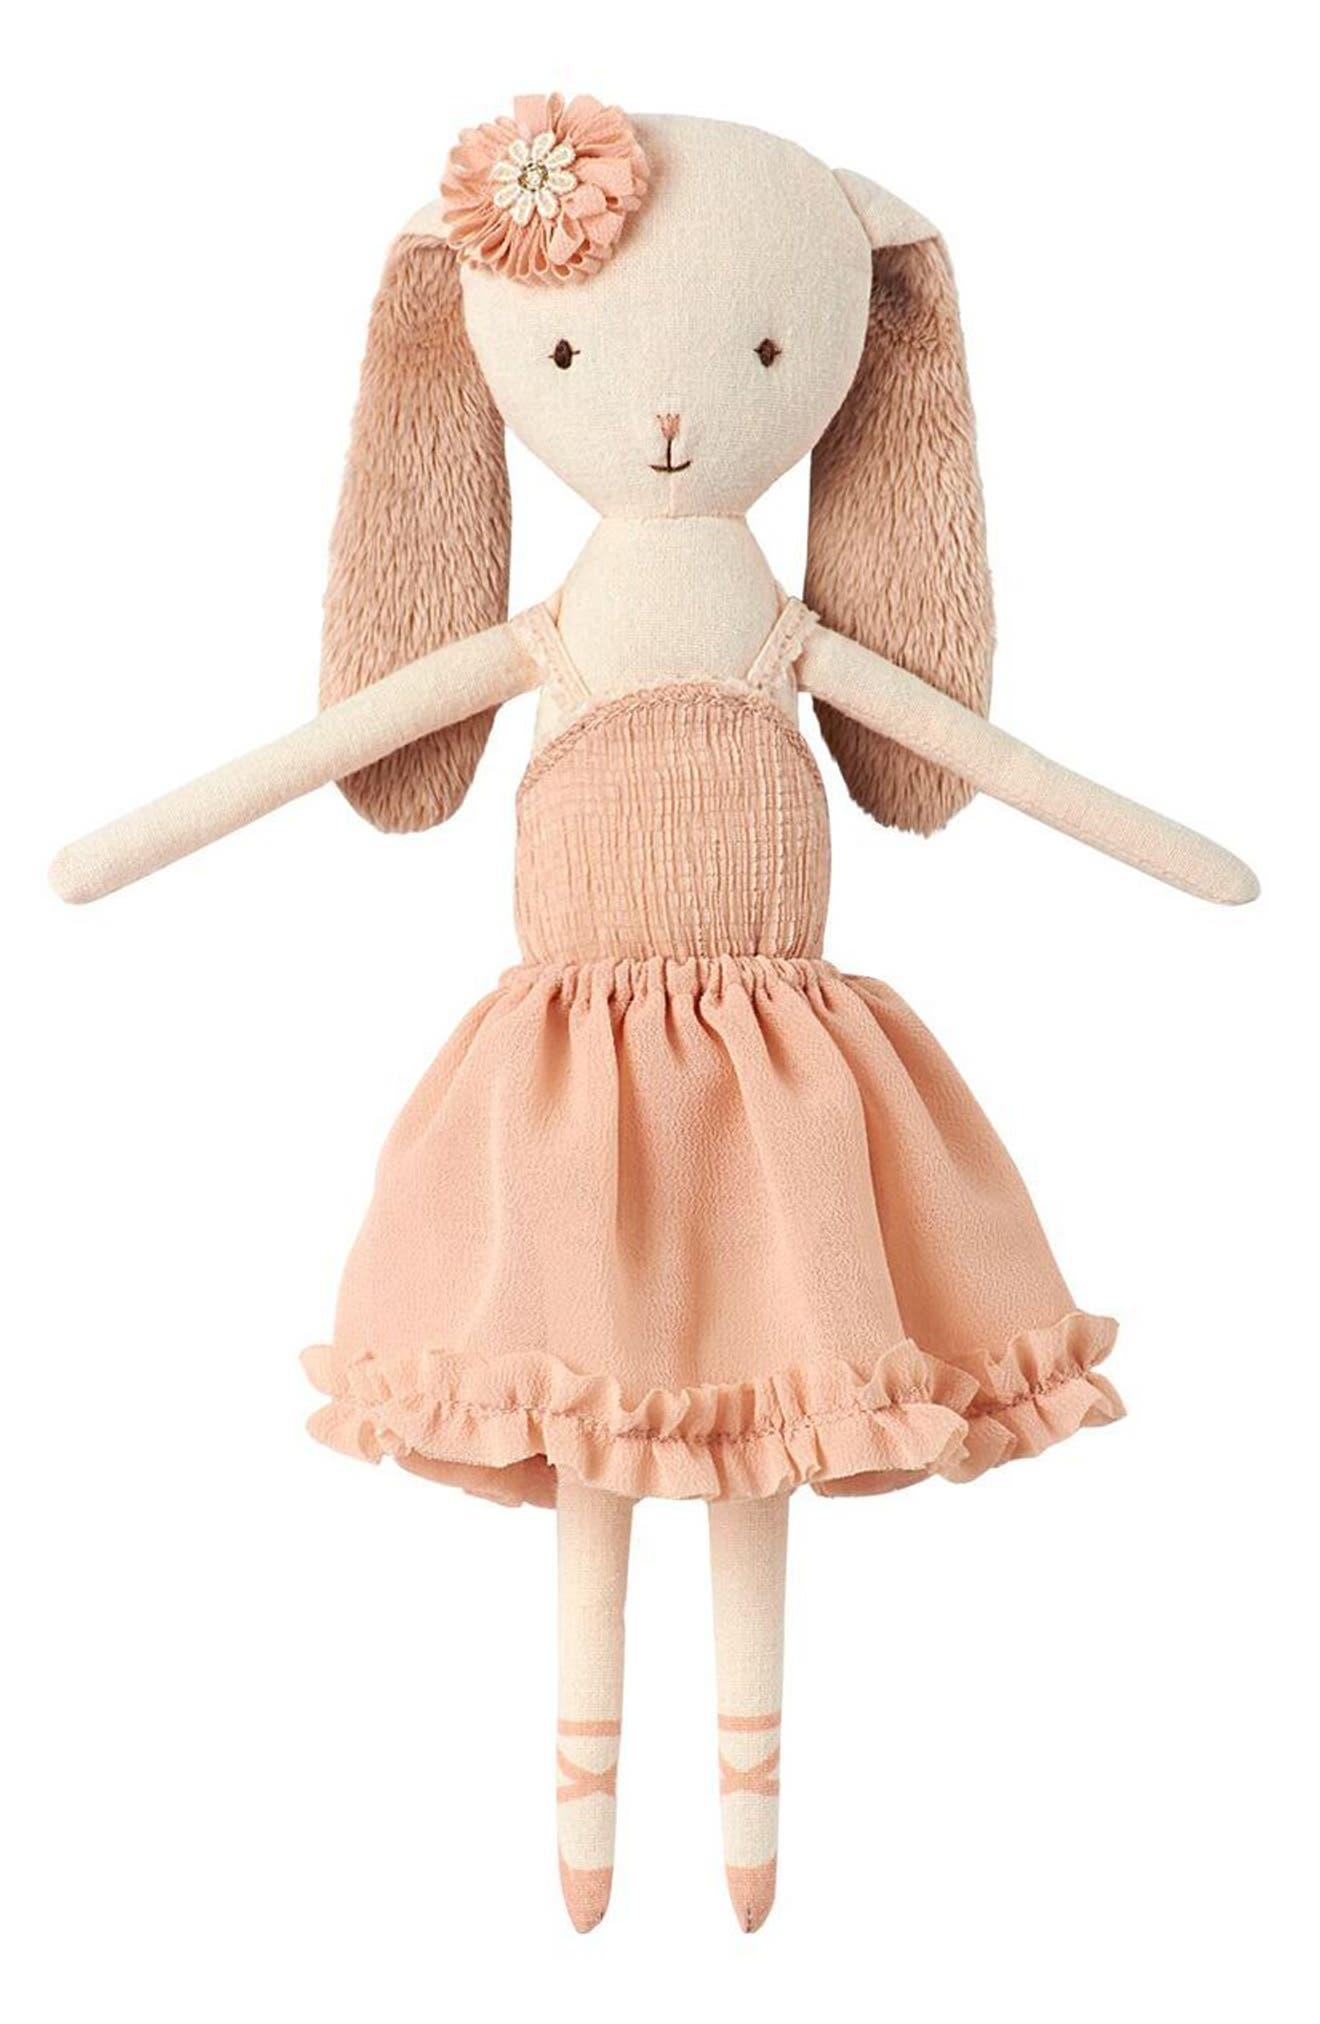 Dancing Bunny Stuffed Animal,                         Main,                         color,